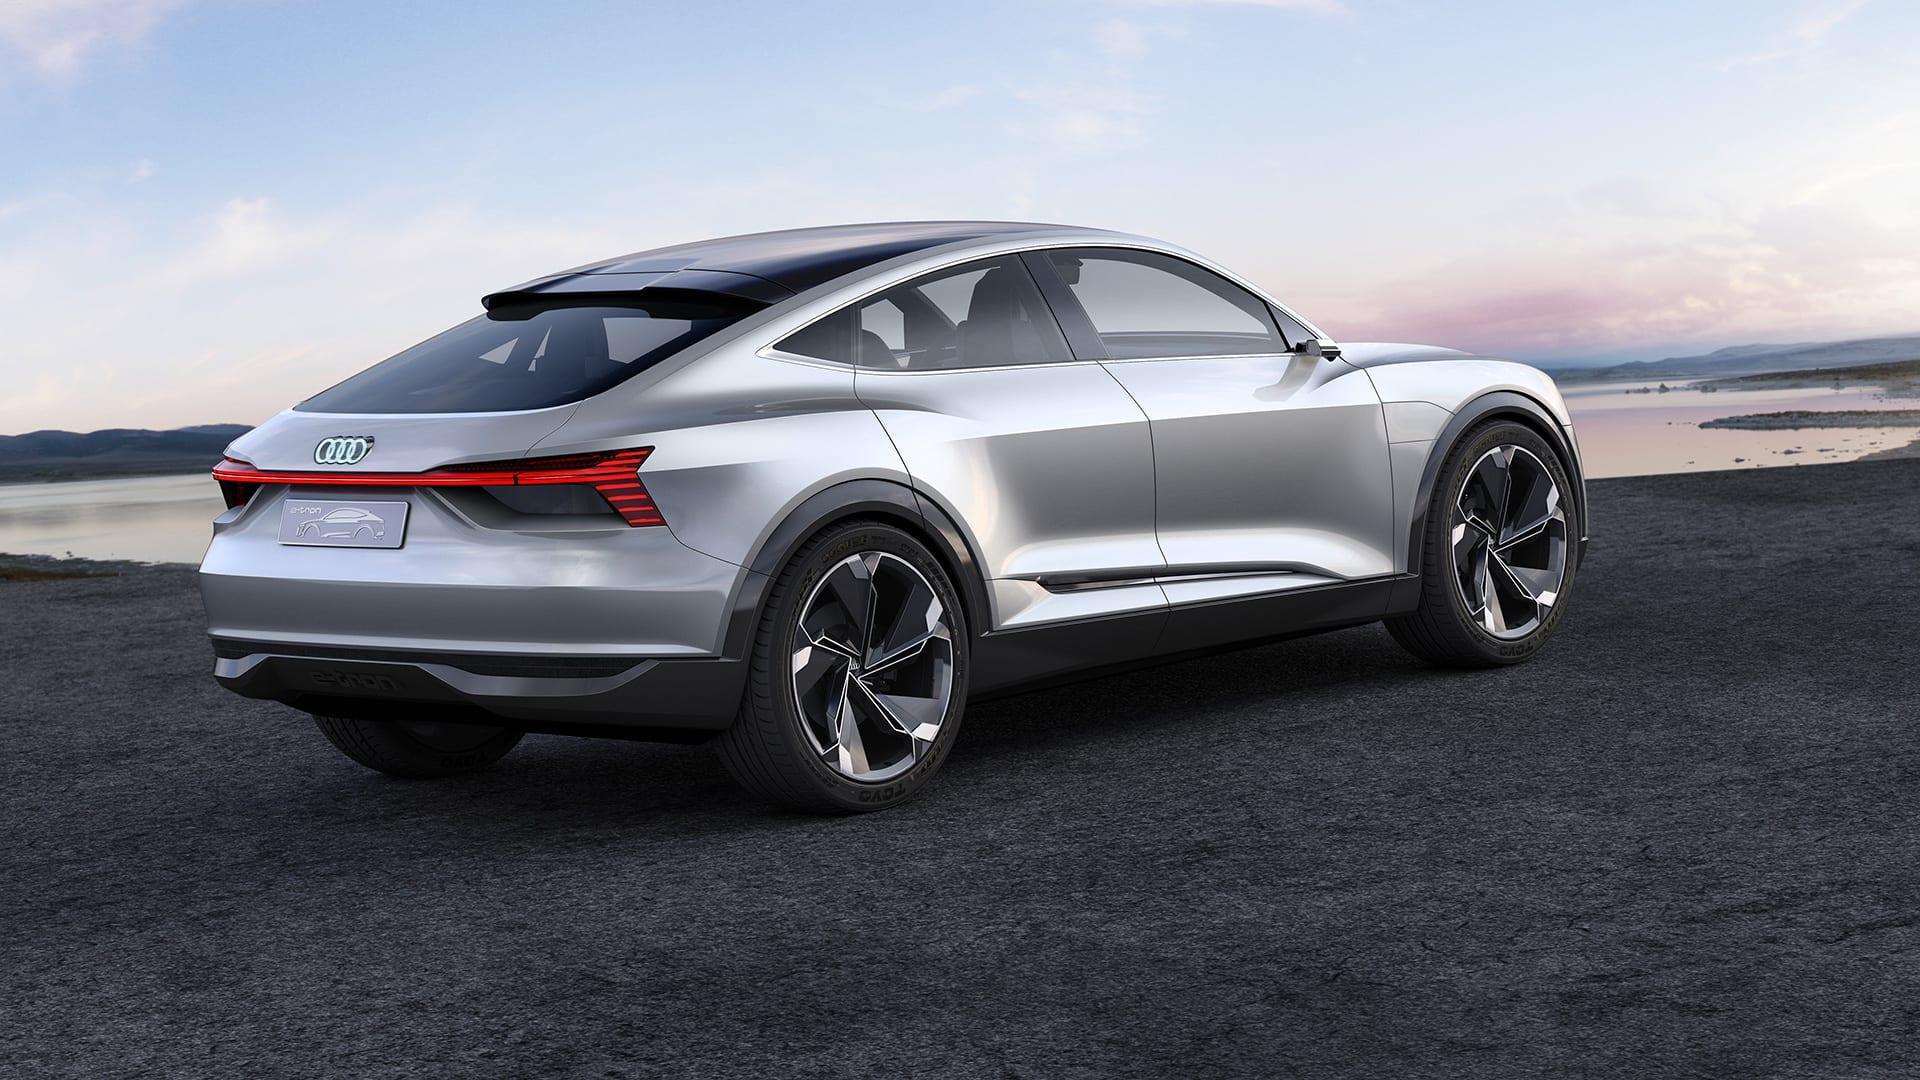 Audi Etron Sportback Concept Tron Audi Australia Official - Audi e car